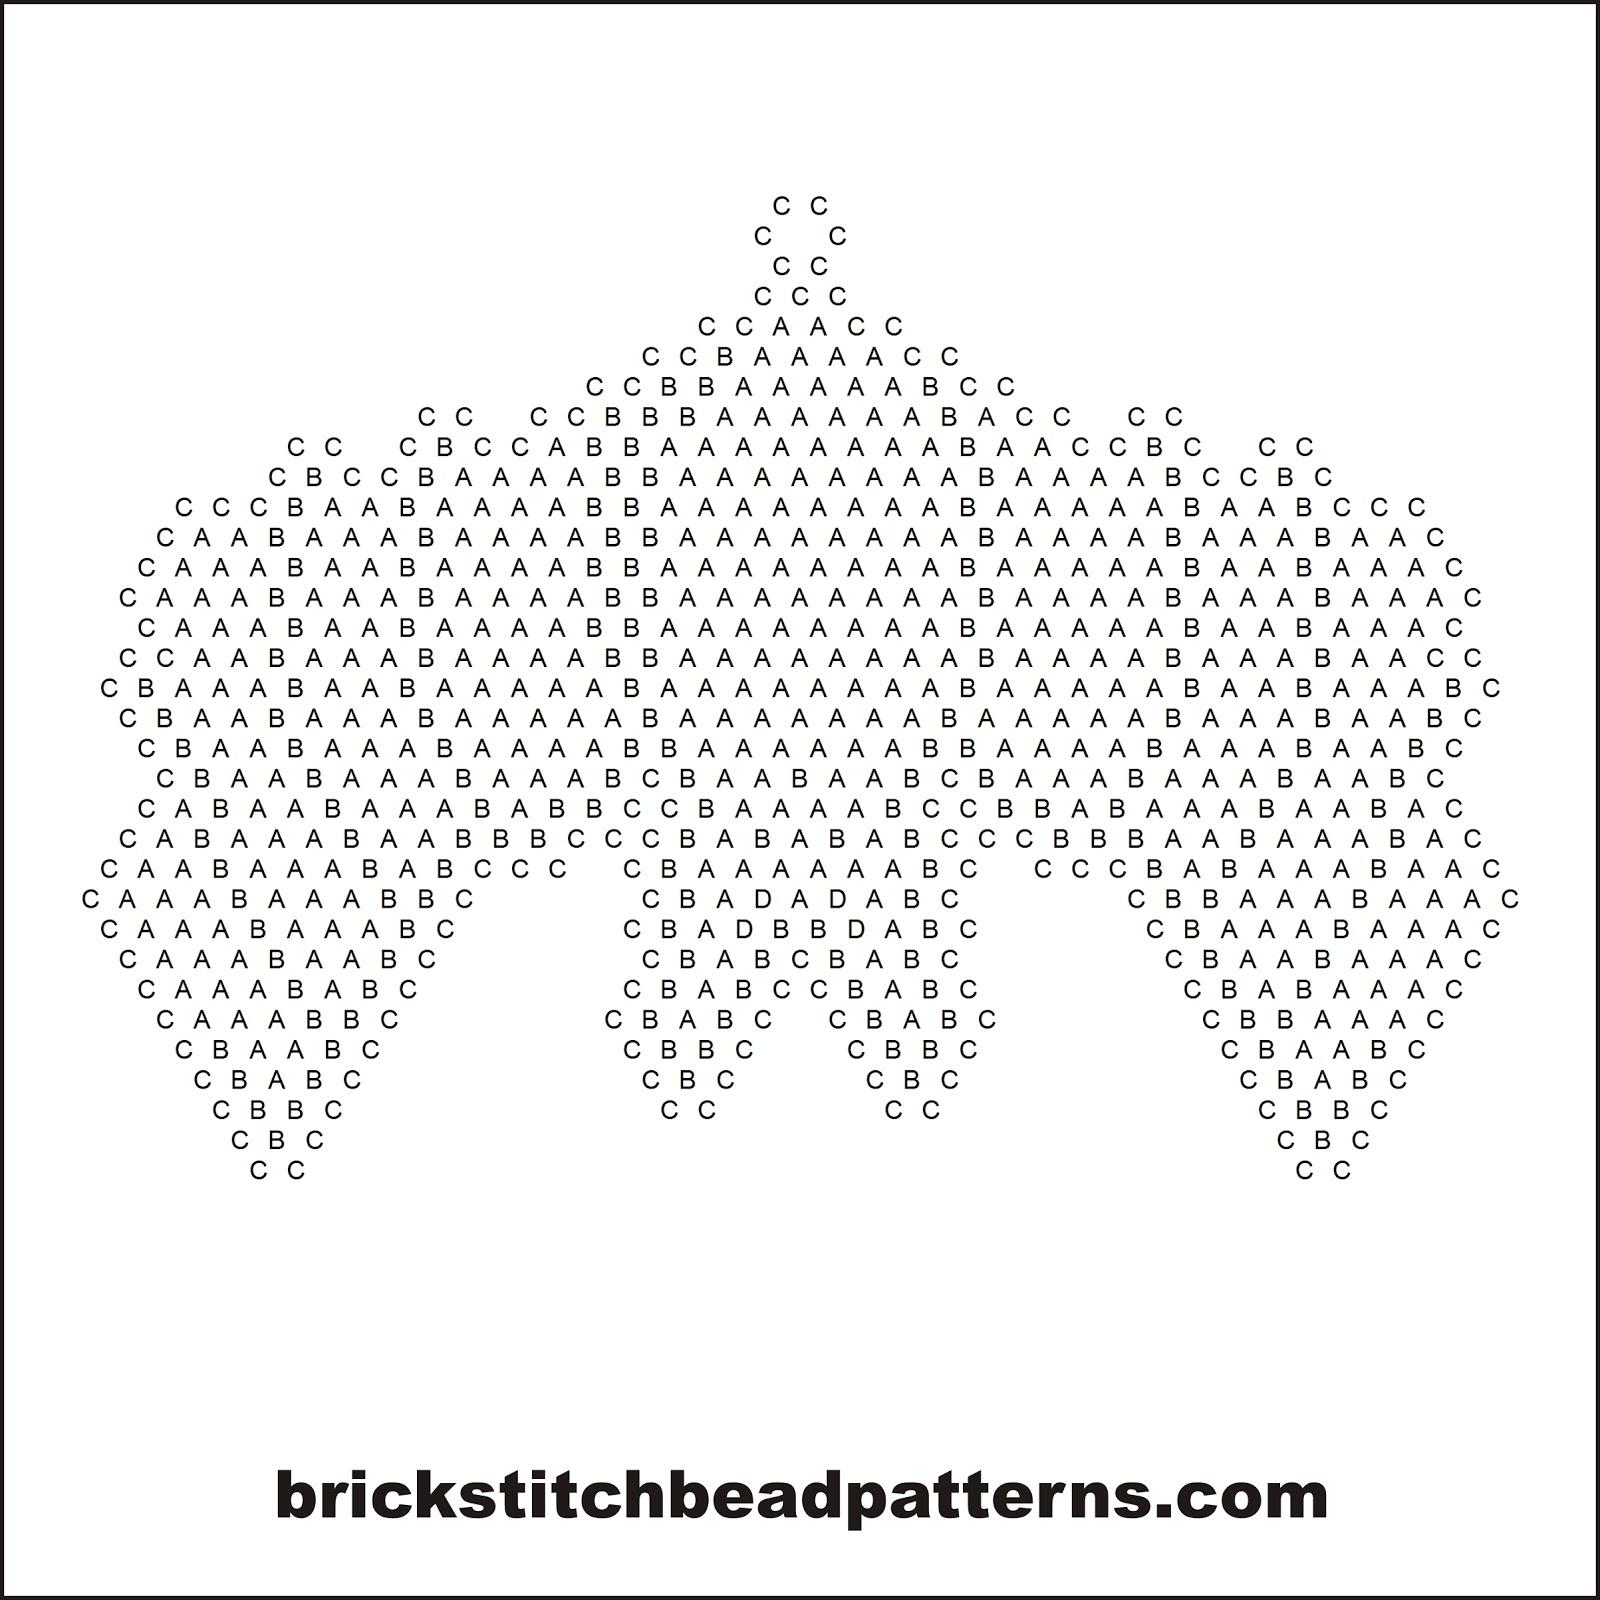 Brick Stitch Bead Patterns Journal Halloween Bat Free Diagram Of Bobble Pattern Seed Pendant Letter Chart